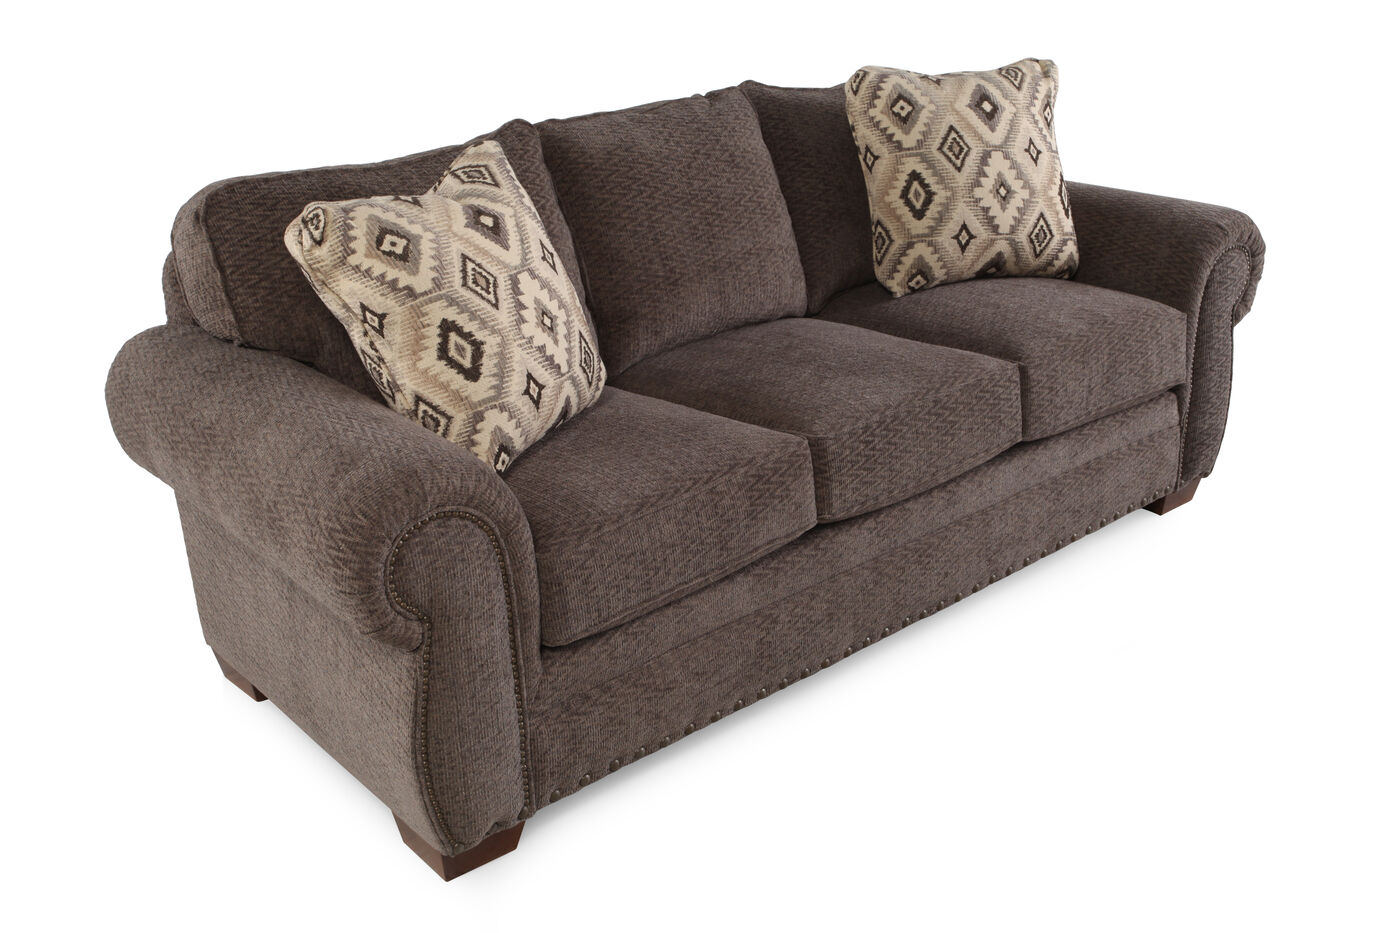 Broyhill Cambridge Sofa Mathis Brothers Furniture